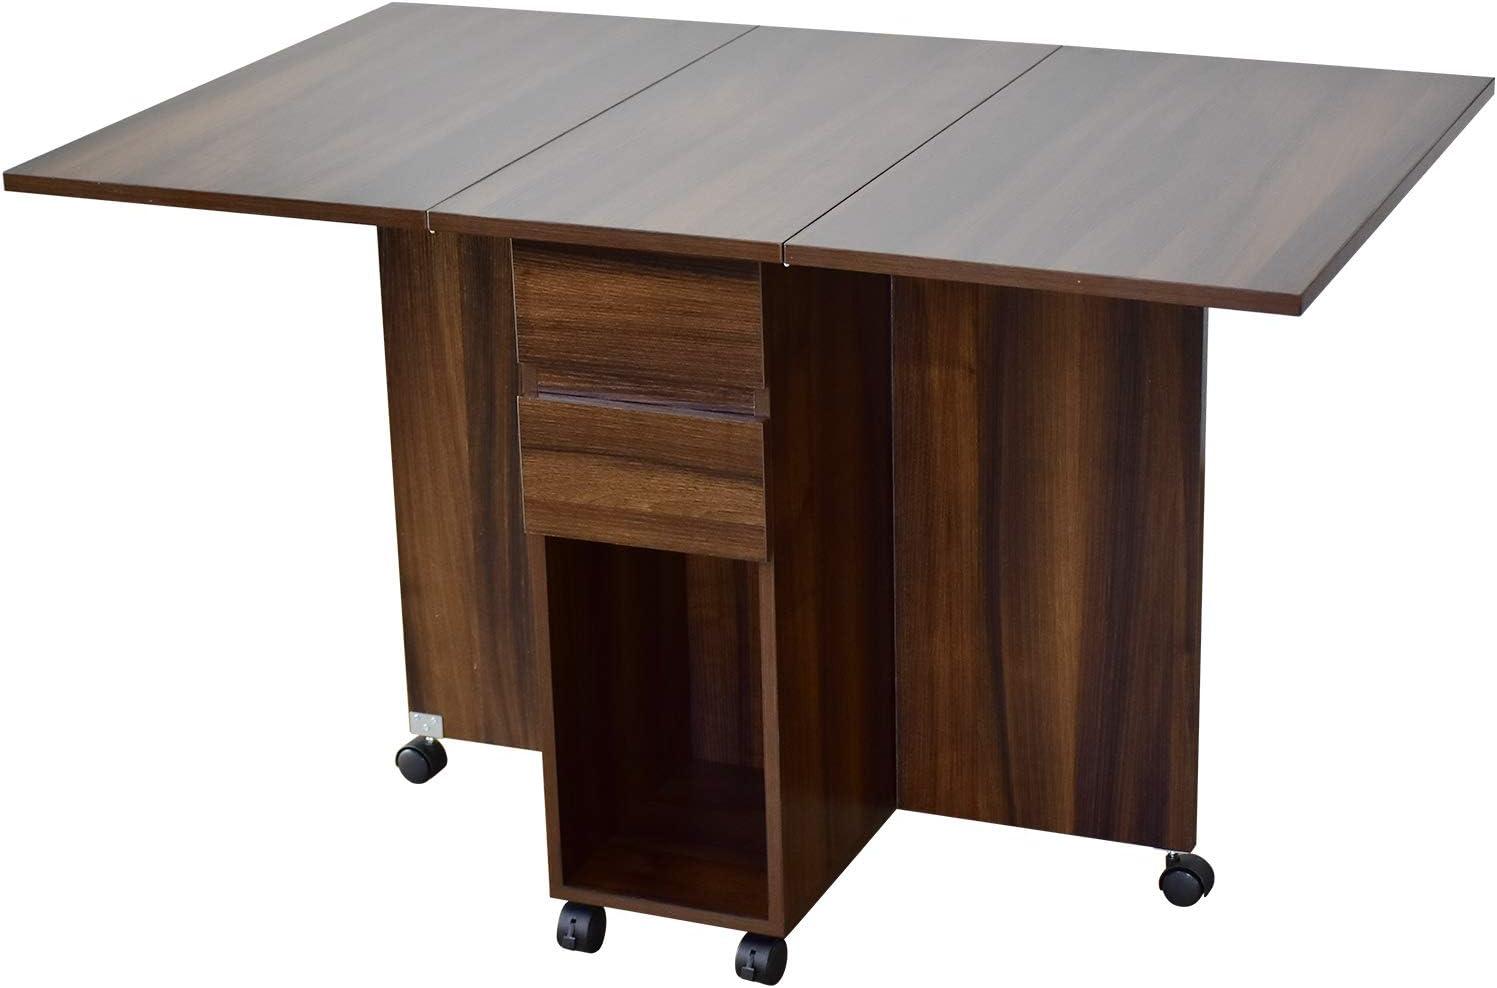 DORIS ダイニングテーブル 折りたたみテーブル キャスター付き 収納 引き出し 可動棚 幅120~37.5 奥行75 ウォルナット パレット